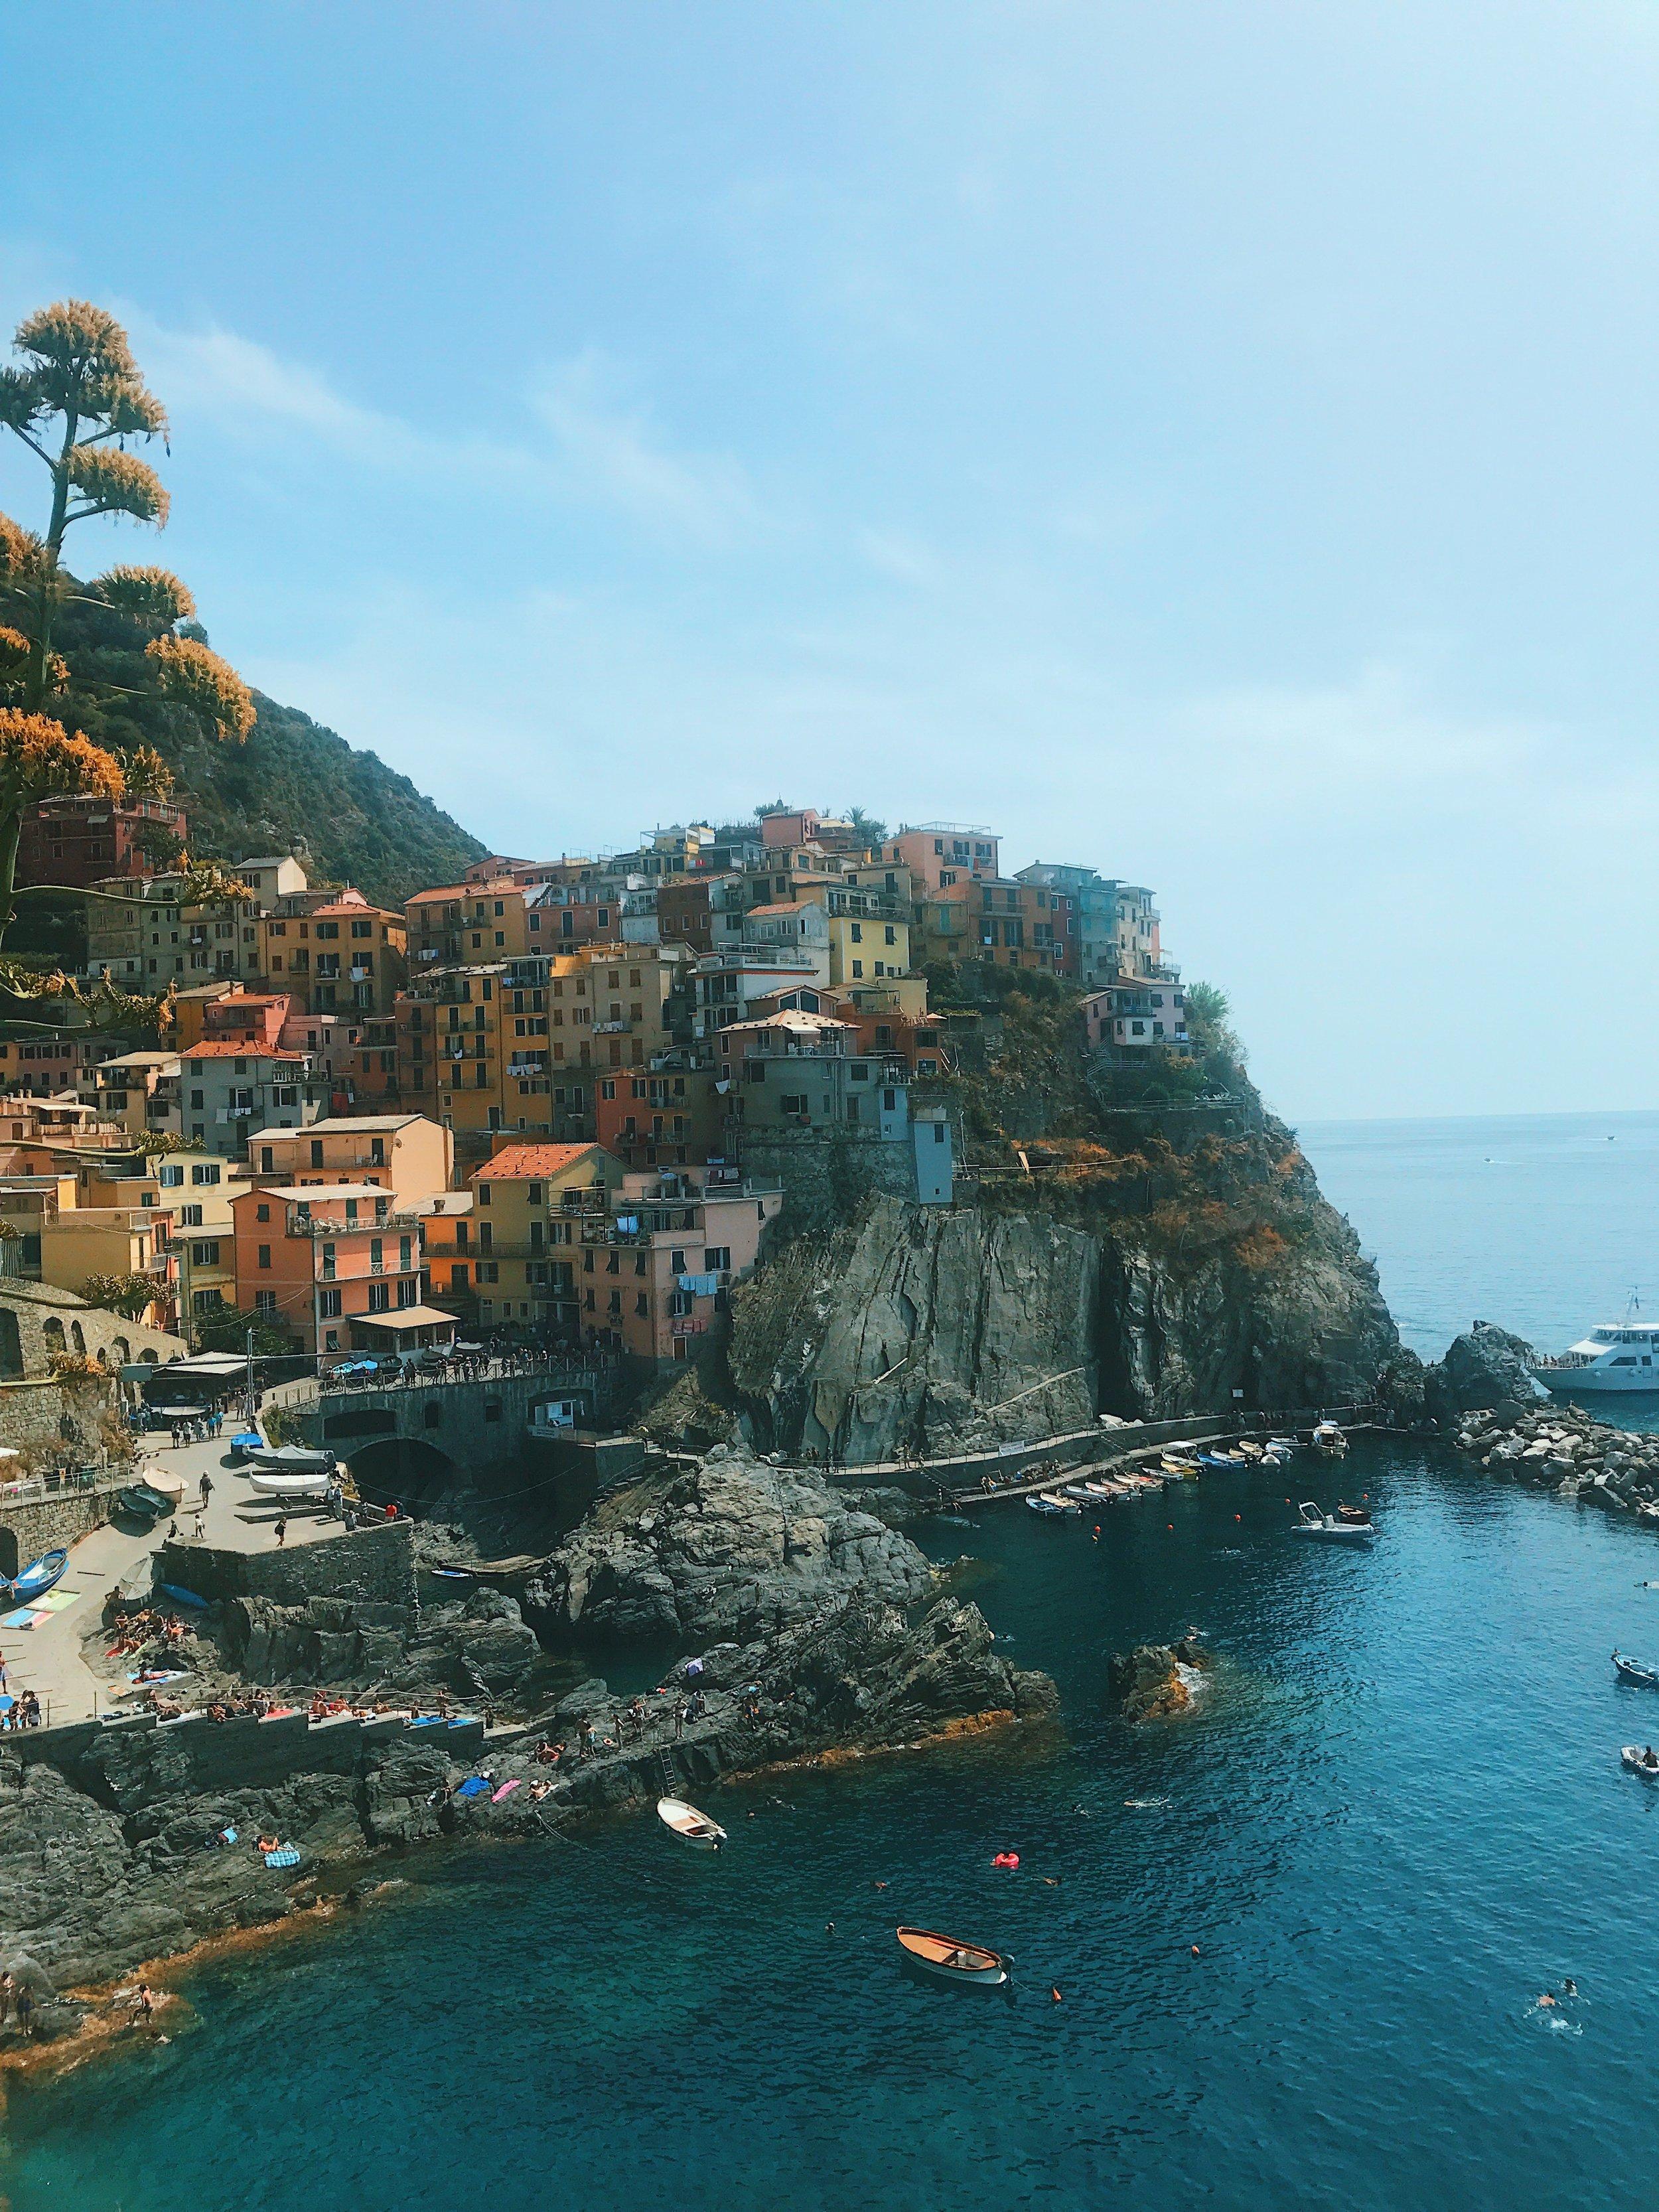 Cinque Terre - Manarola - Italy - Jessica Withey - Travel Blogger